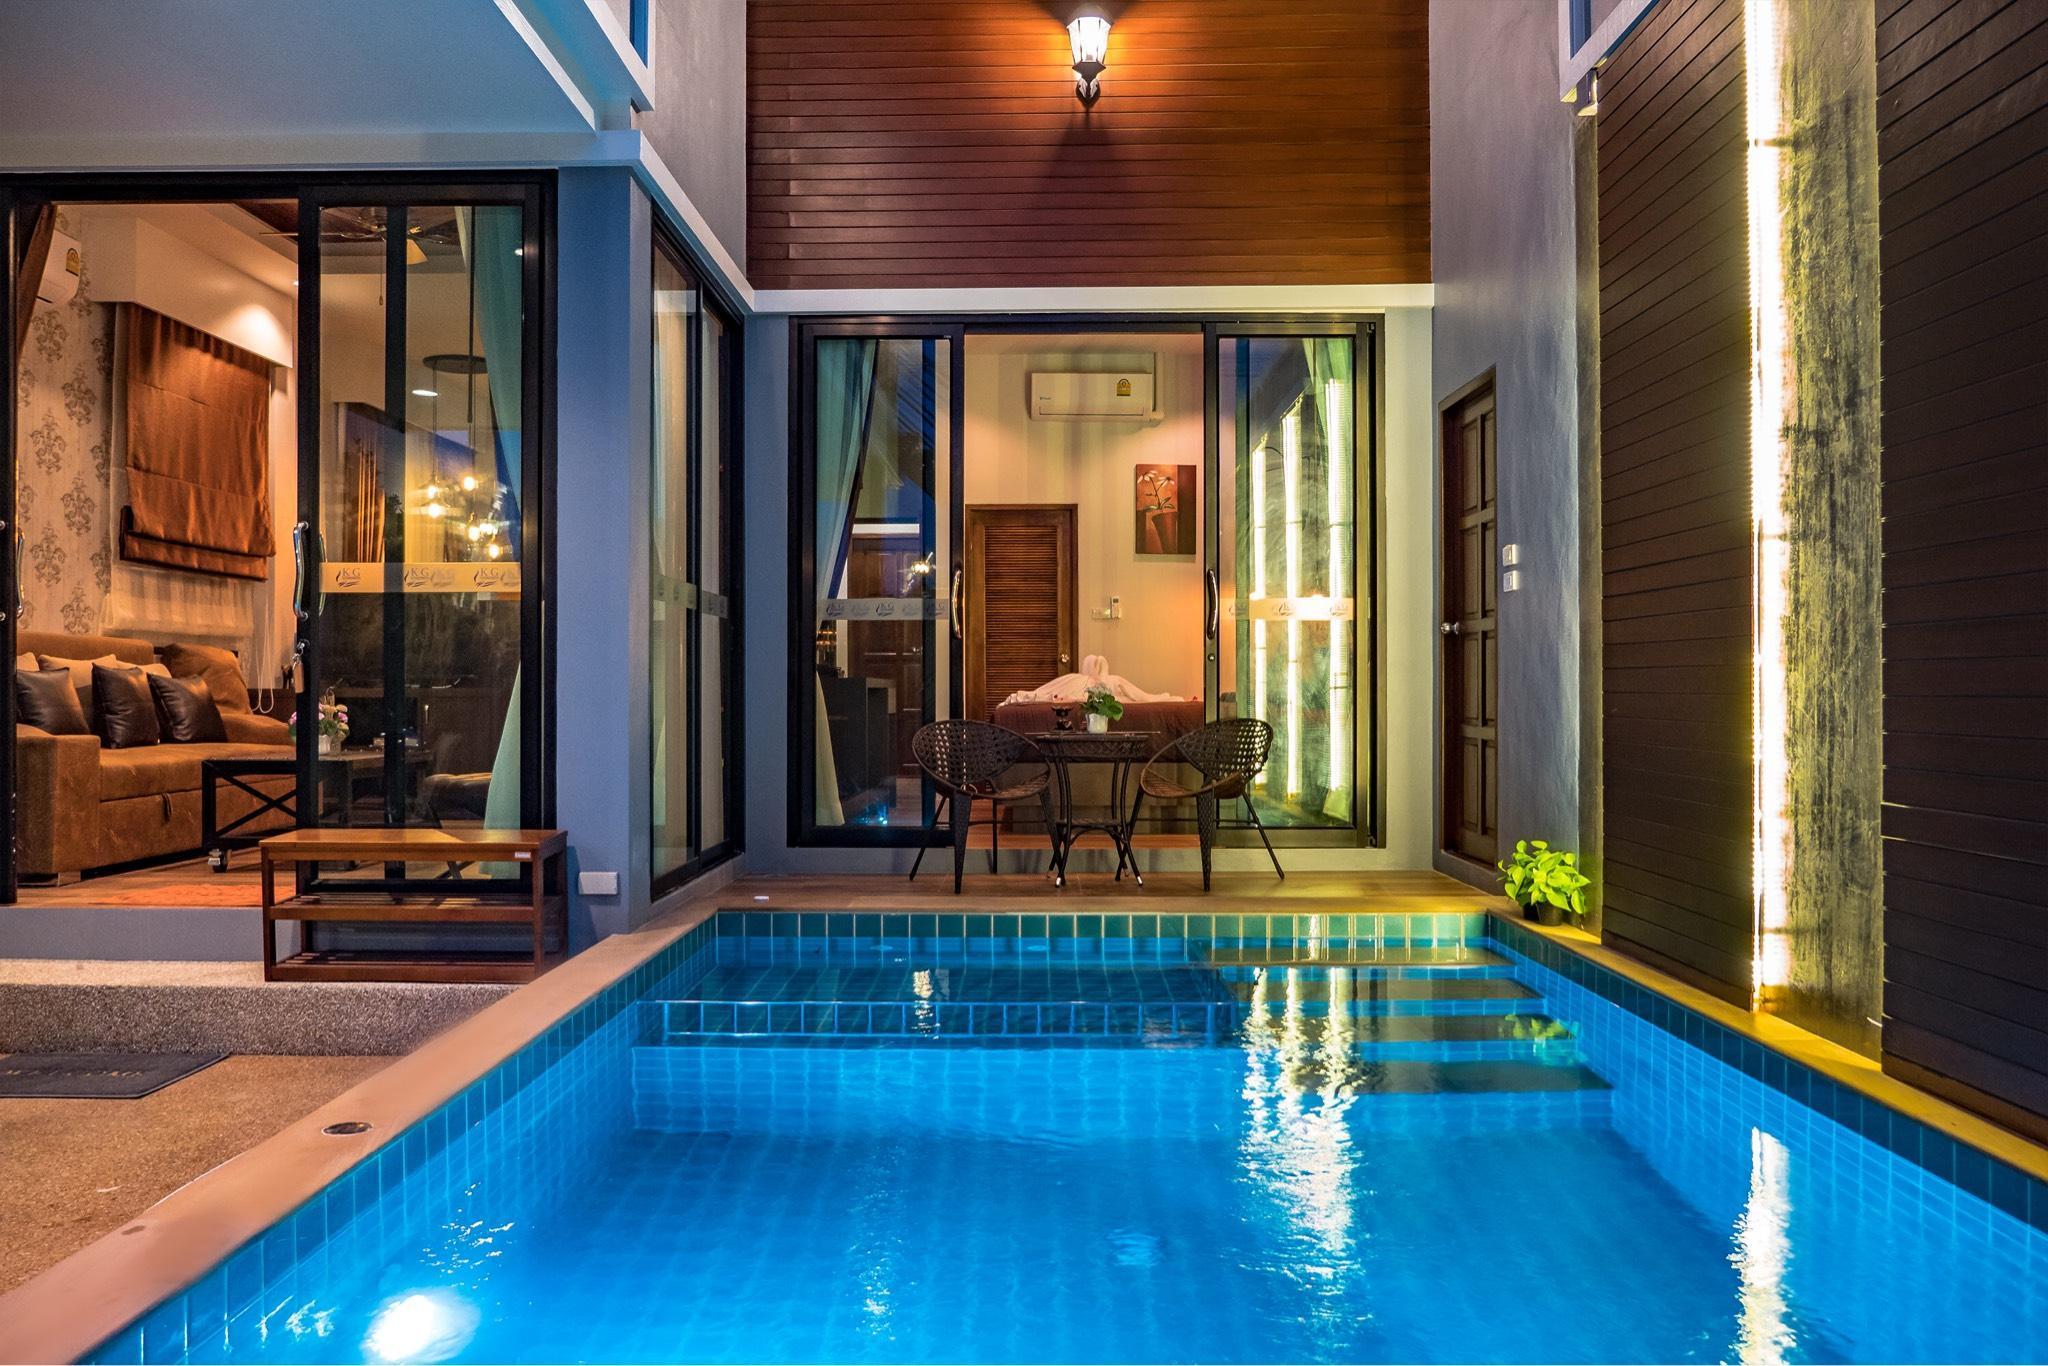 KG Private Pool Villa KG 92